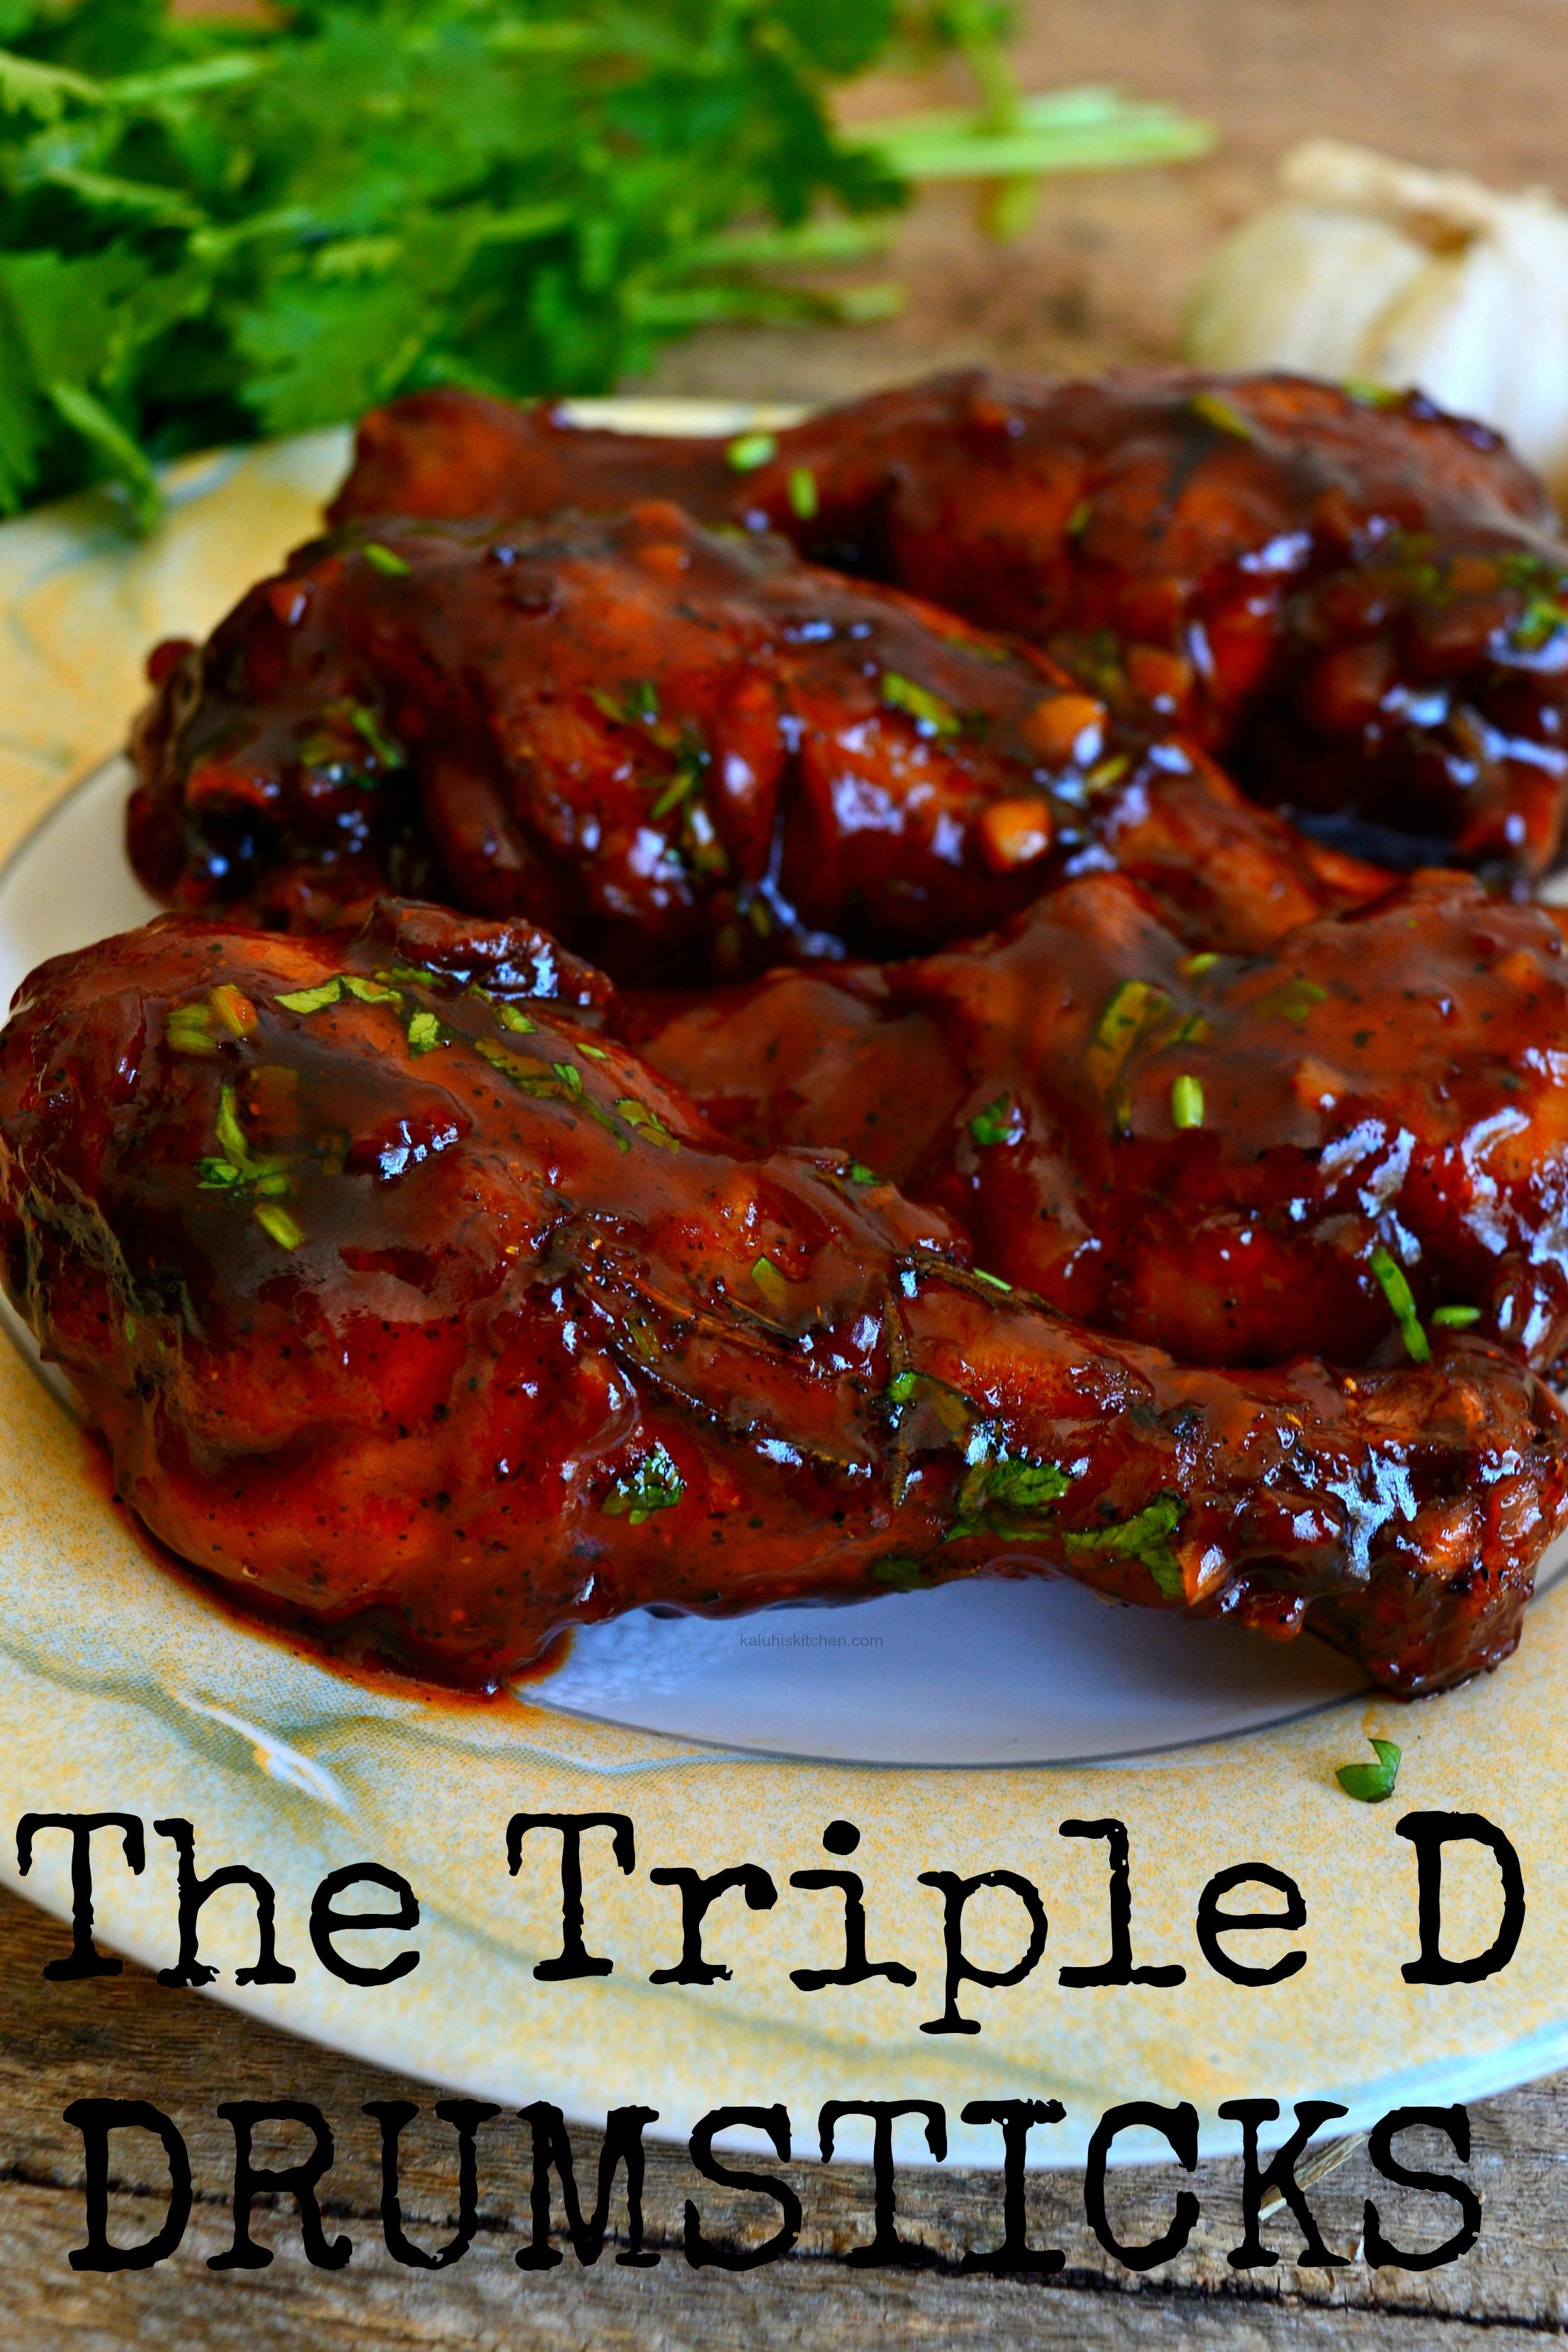 triple-d-drumsticks_best-kenyan-food-blogs_how-to-make-drumsticks_best-african-food-blogs_kaluhiskitchen-com